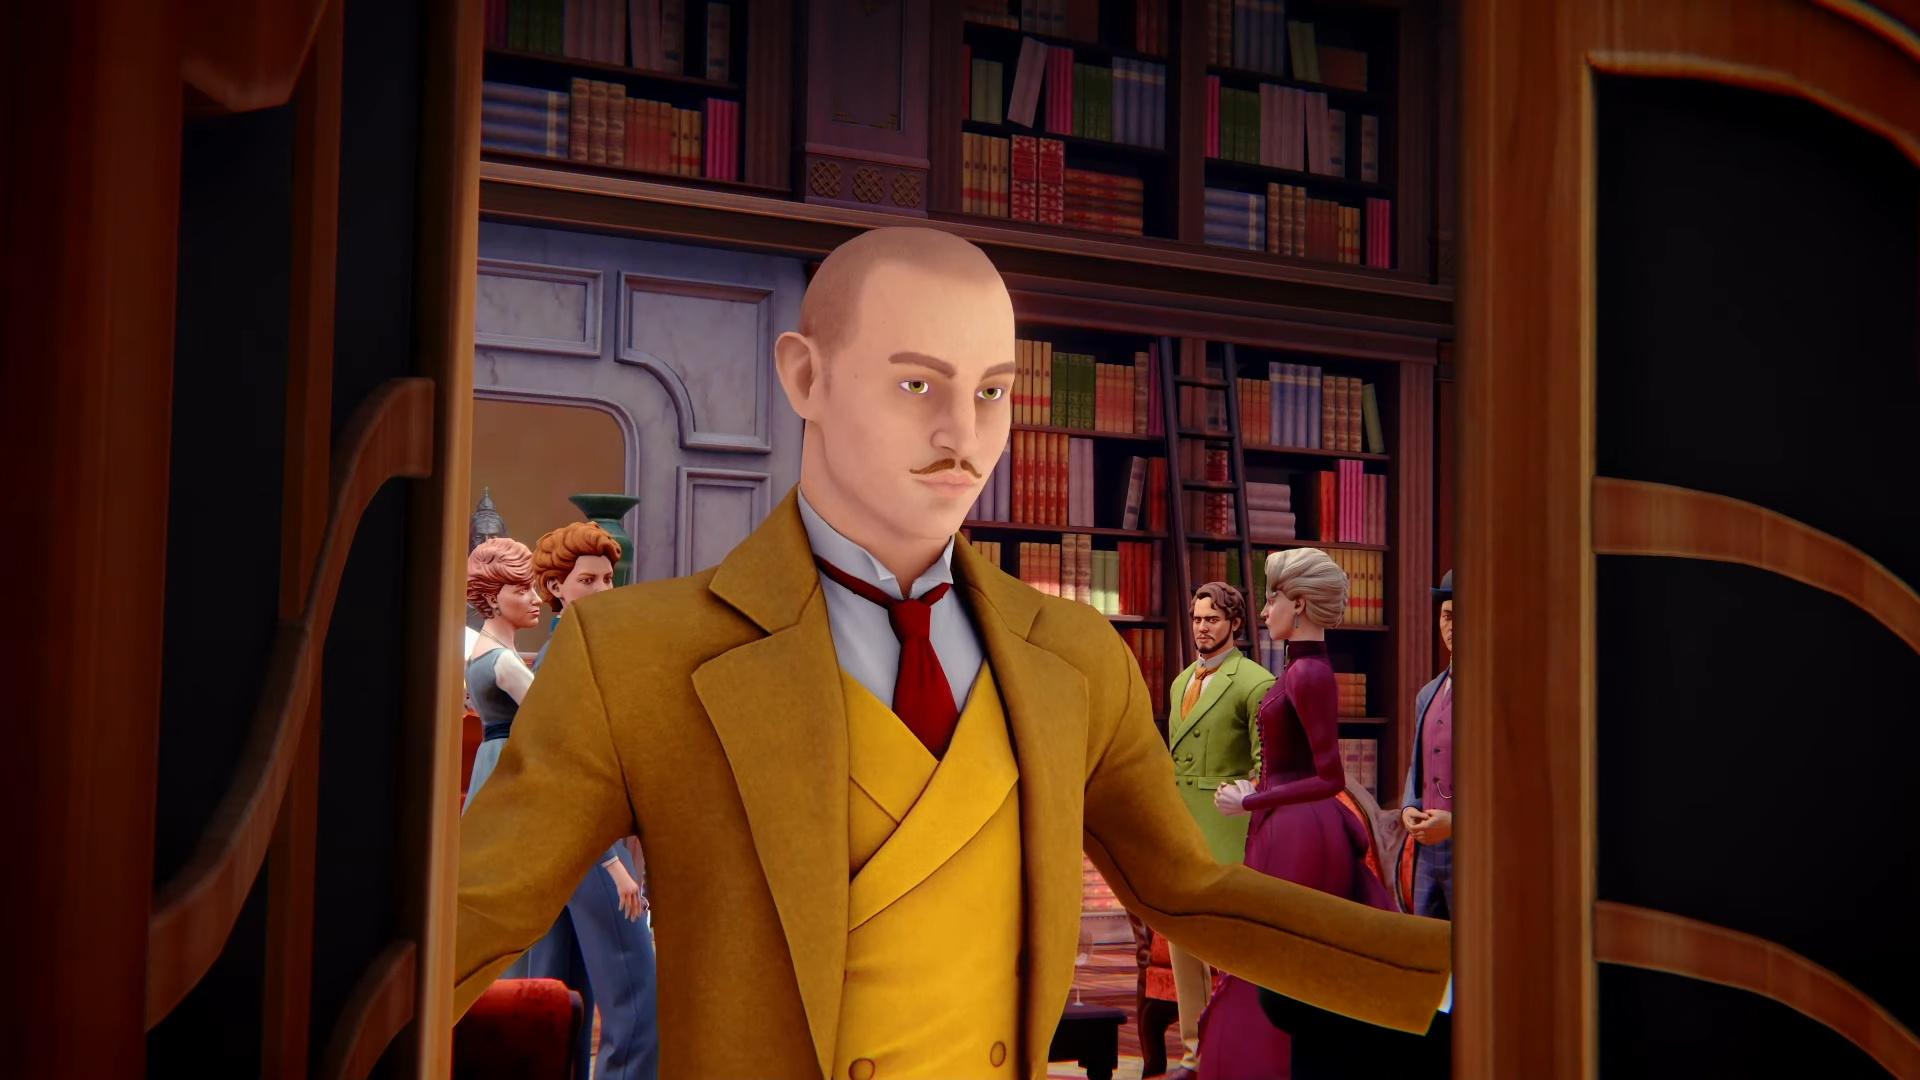 Вышел приключенческий детектив Agatha Christie - Hercule Poirot: The First Cases